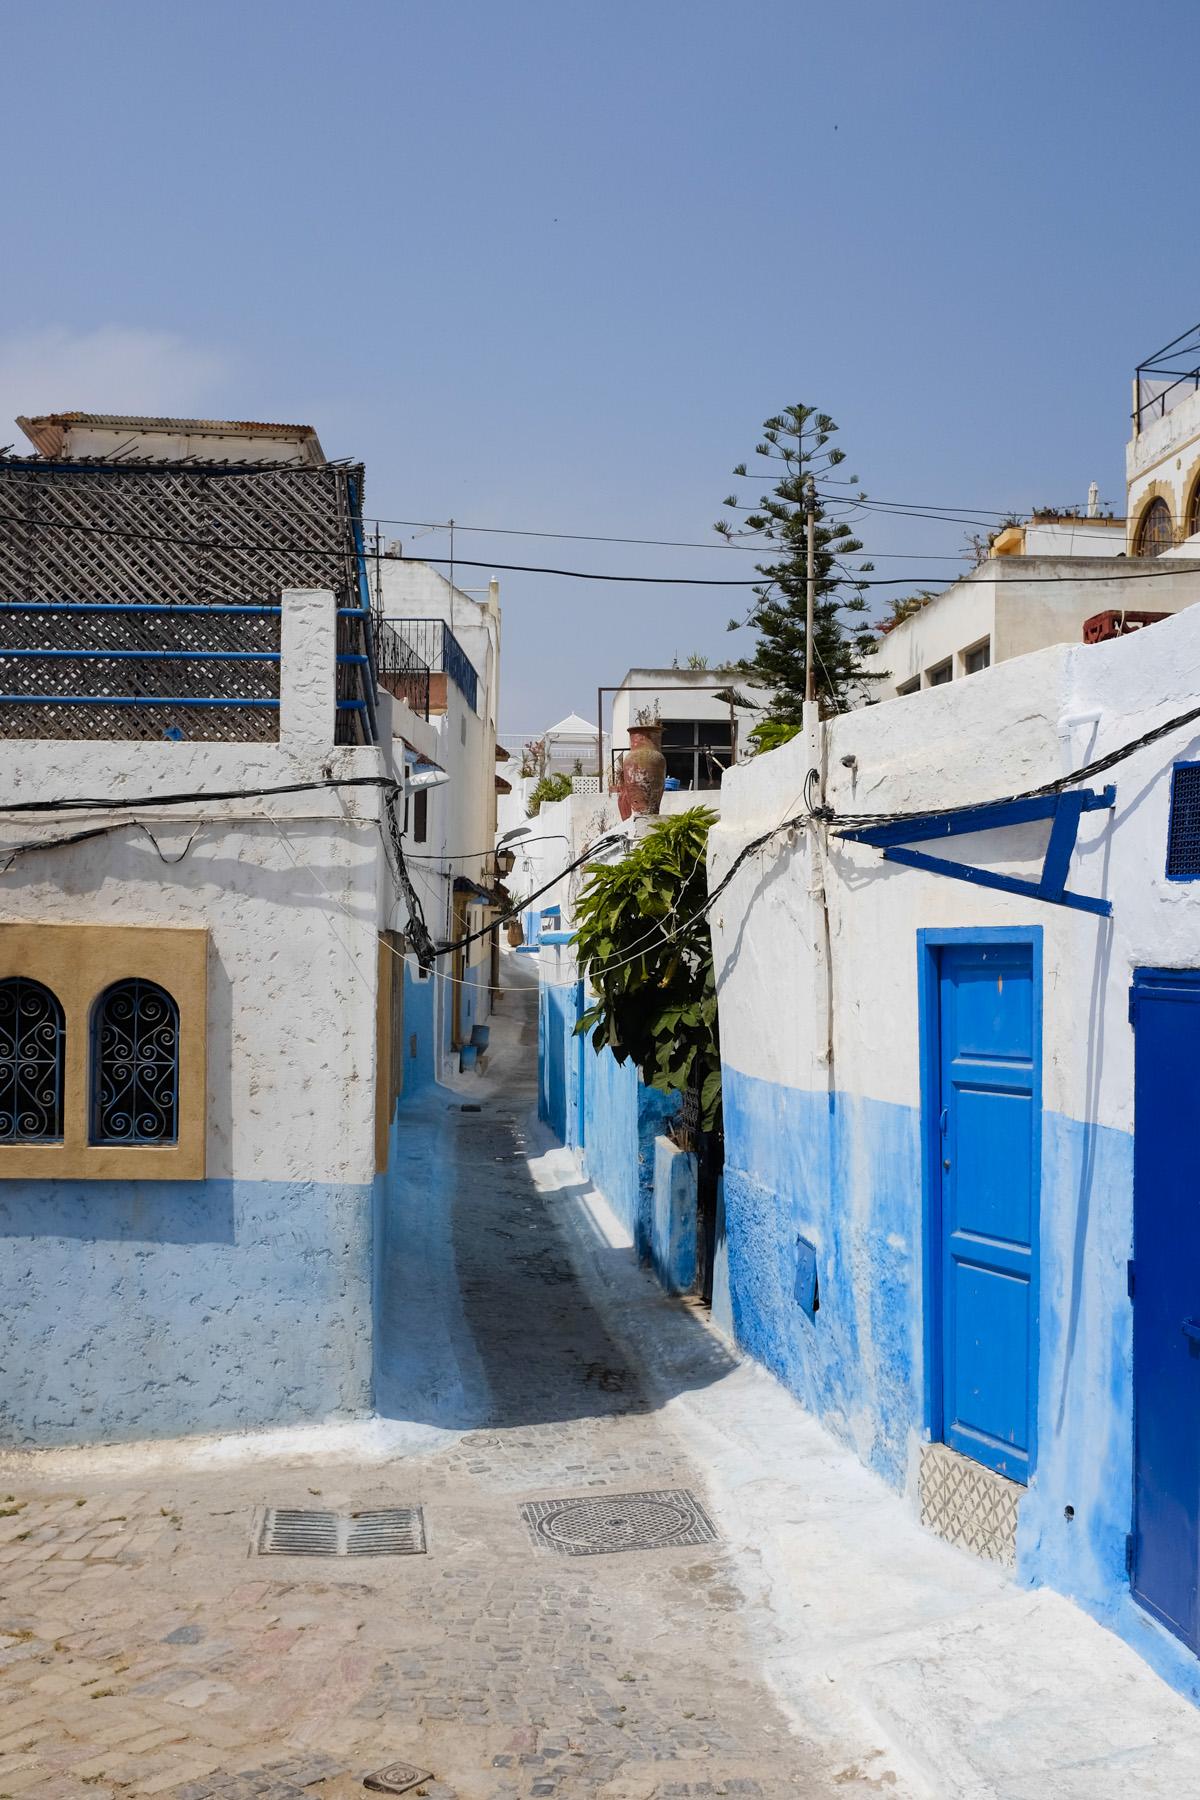 201307 Rabat 028.jpg